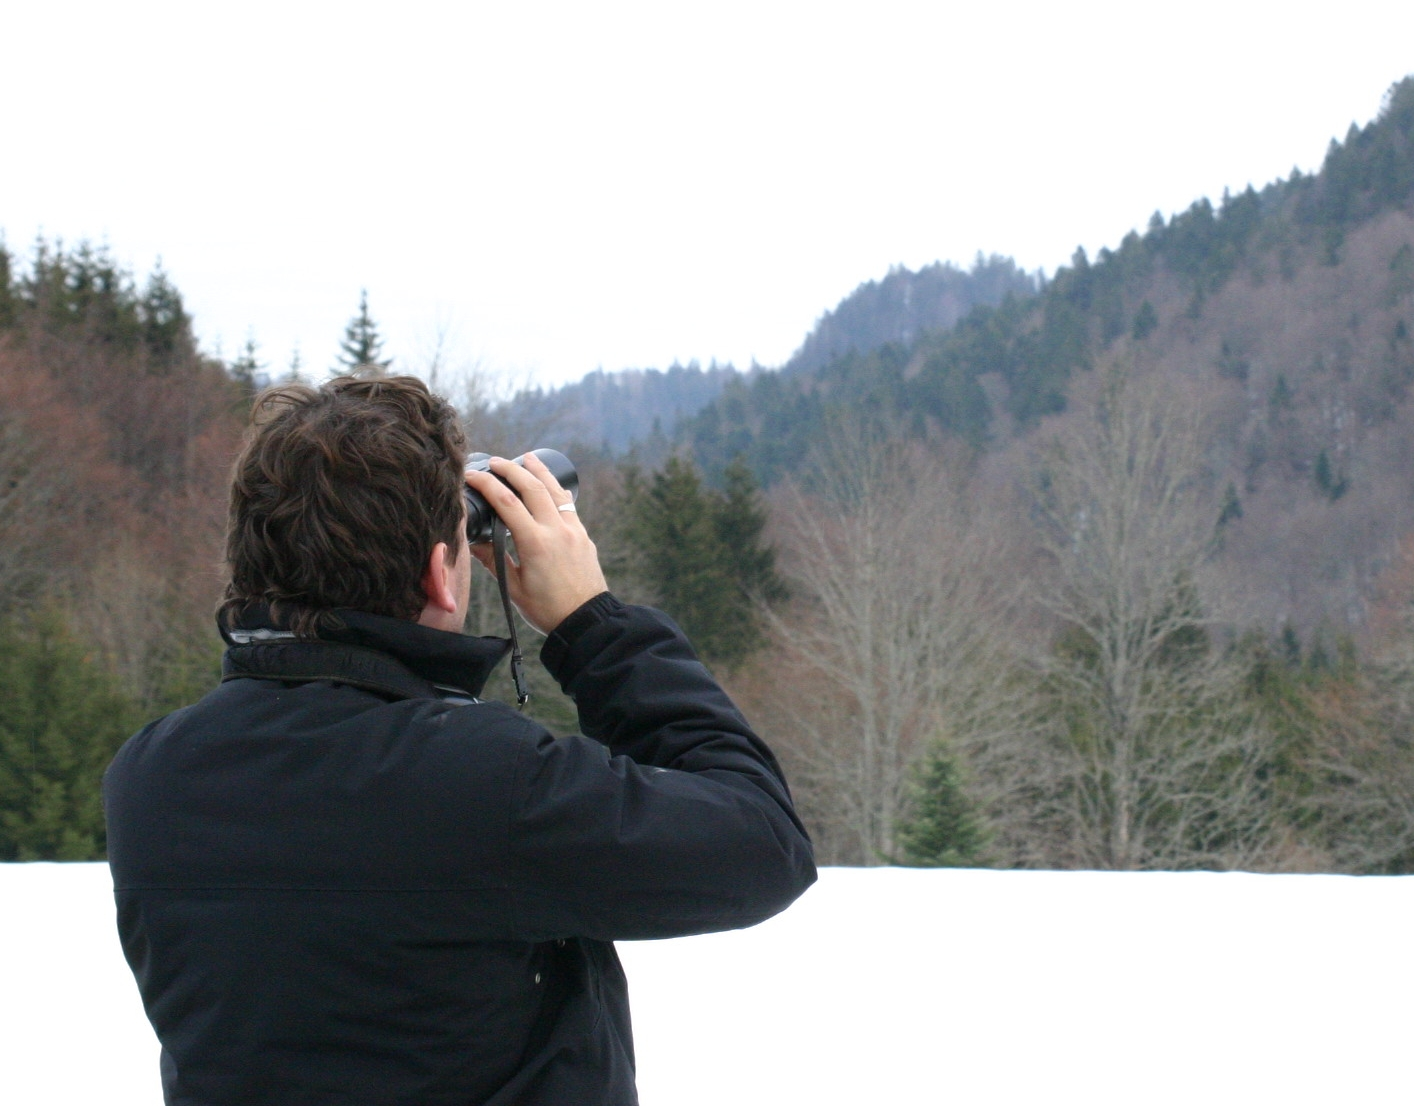 https://cdnfiles1.biolovision.net/franche-comte.lpo.fr/userfiles/Modedemploi/observationJaseurJuraPetitjean-retouch.jpg